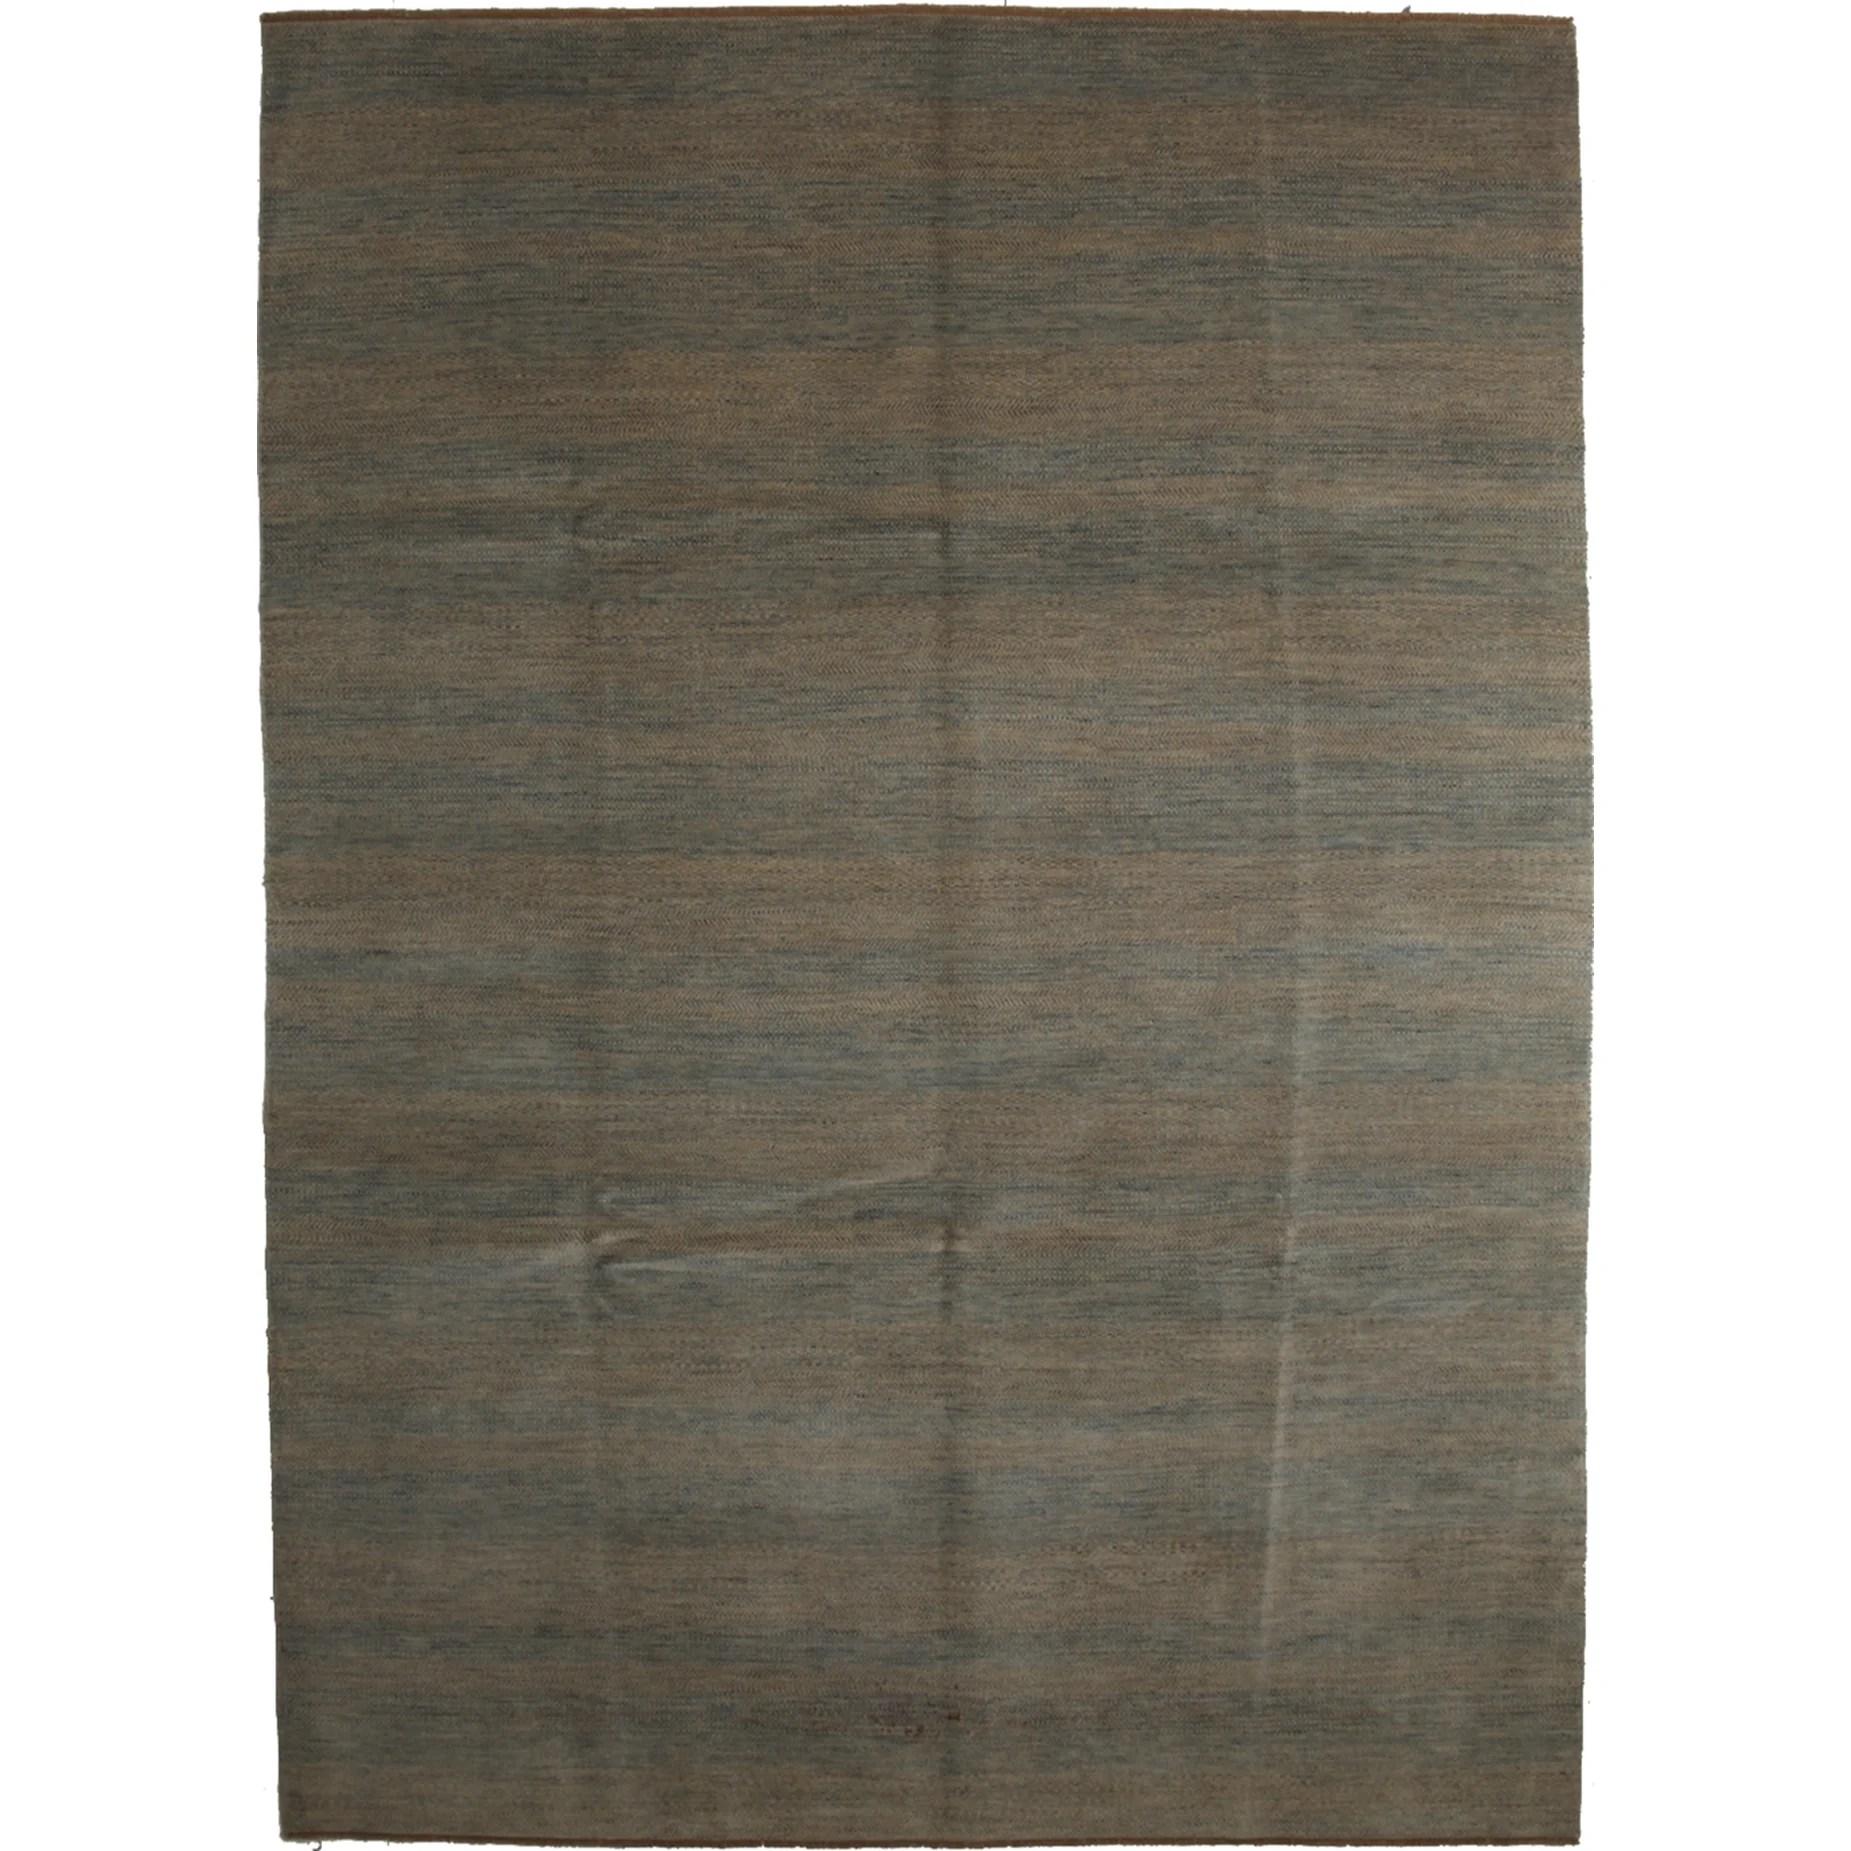 Hamirdah Beige Wool Han-knotted Area Rug (8'9 x 12'1)